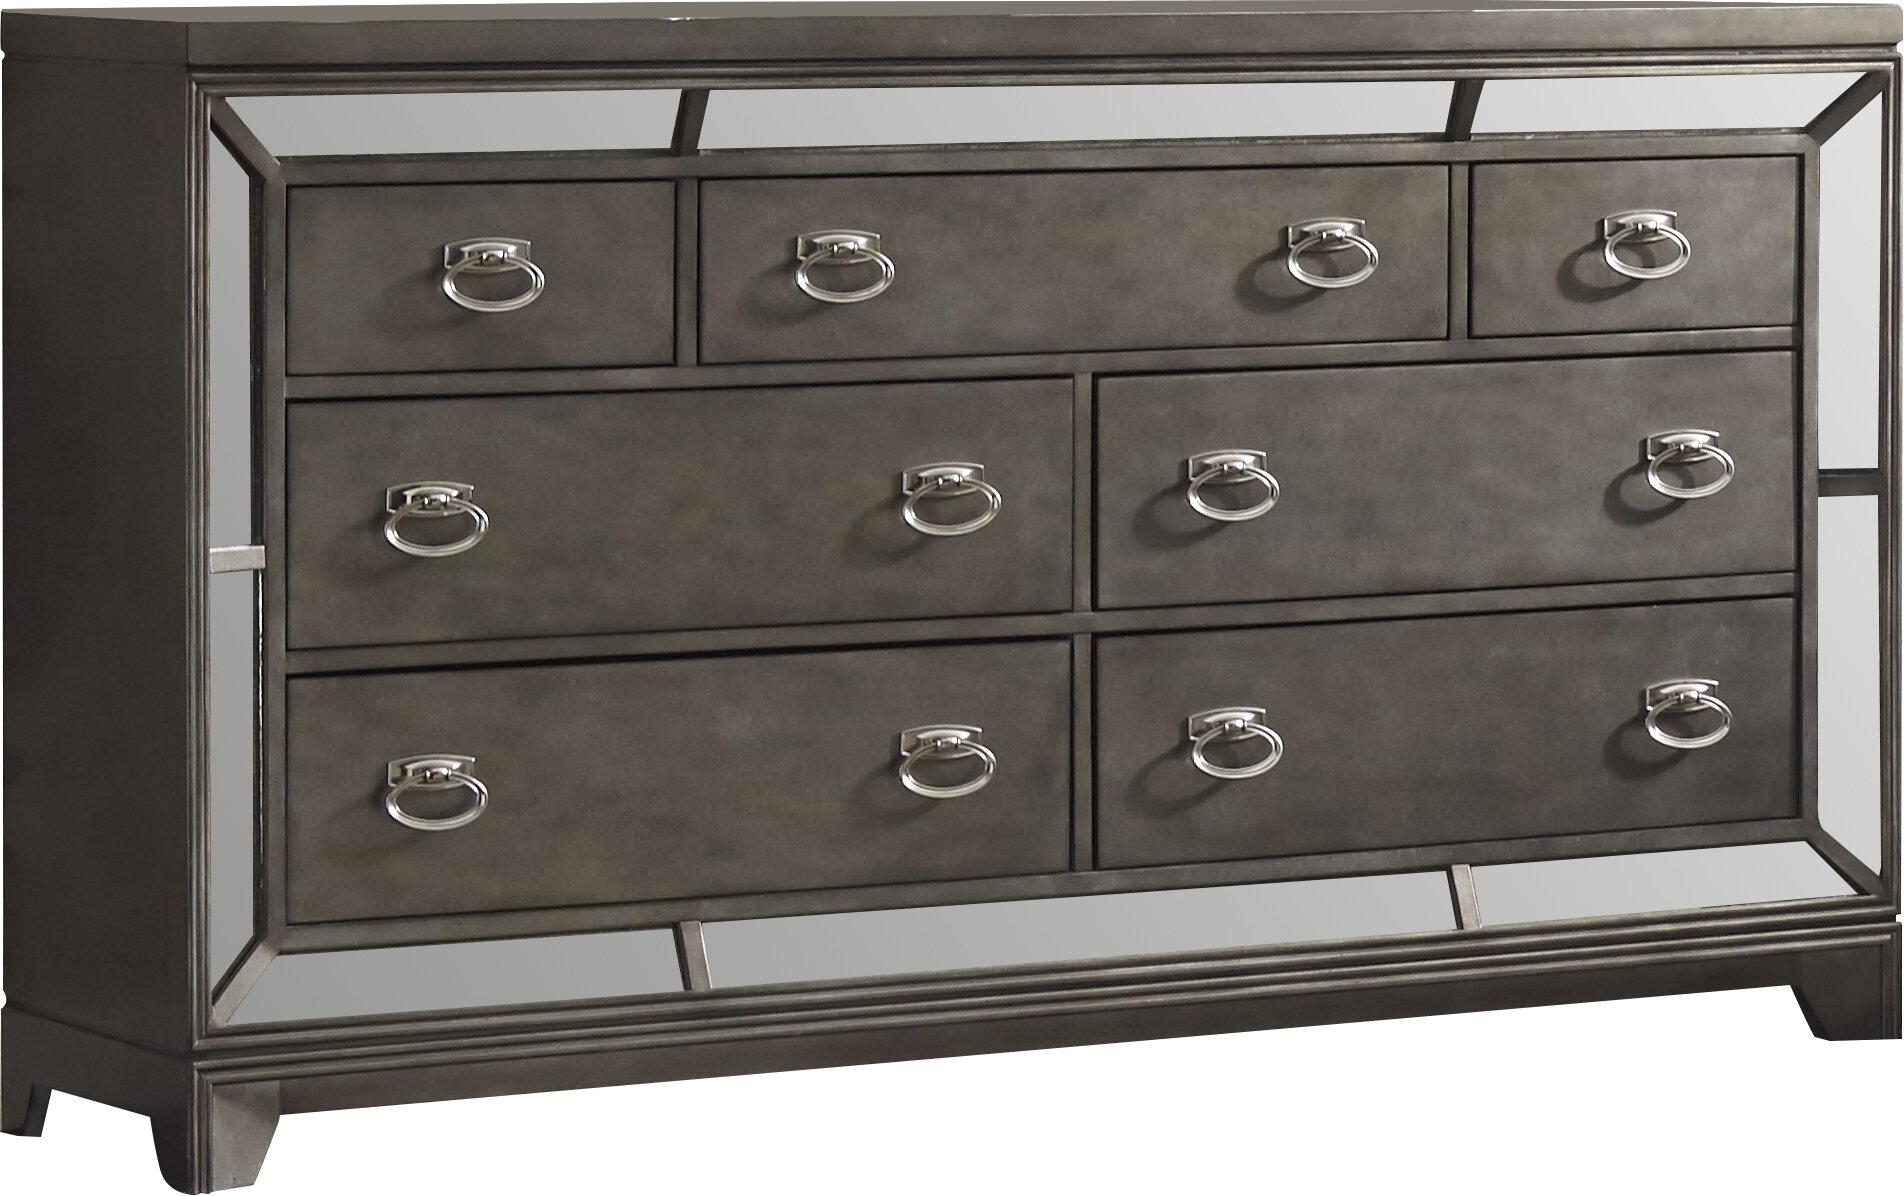 bbb668fa41 Roxie 7 Drawer Dresser & Reviews | Joss & Main